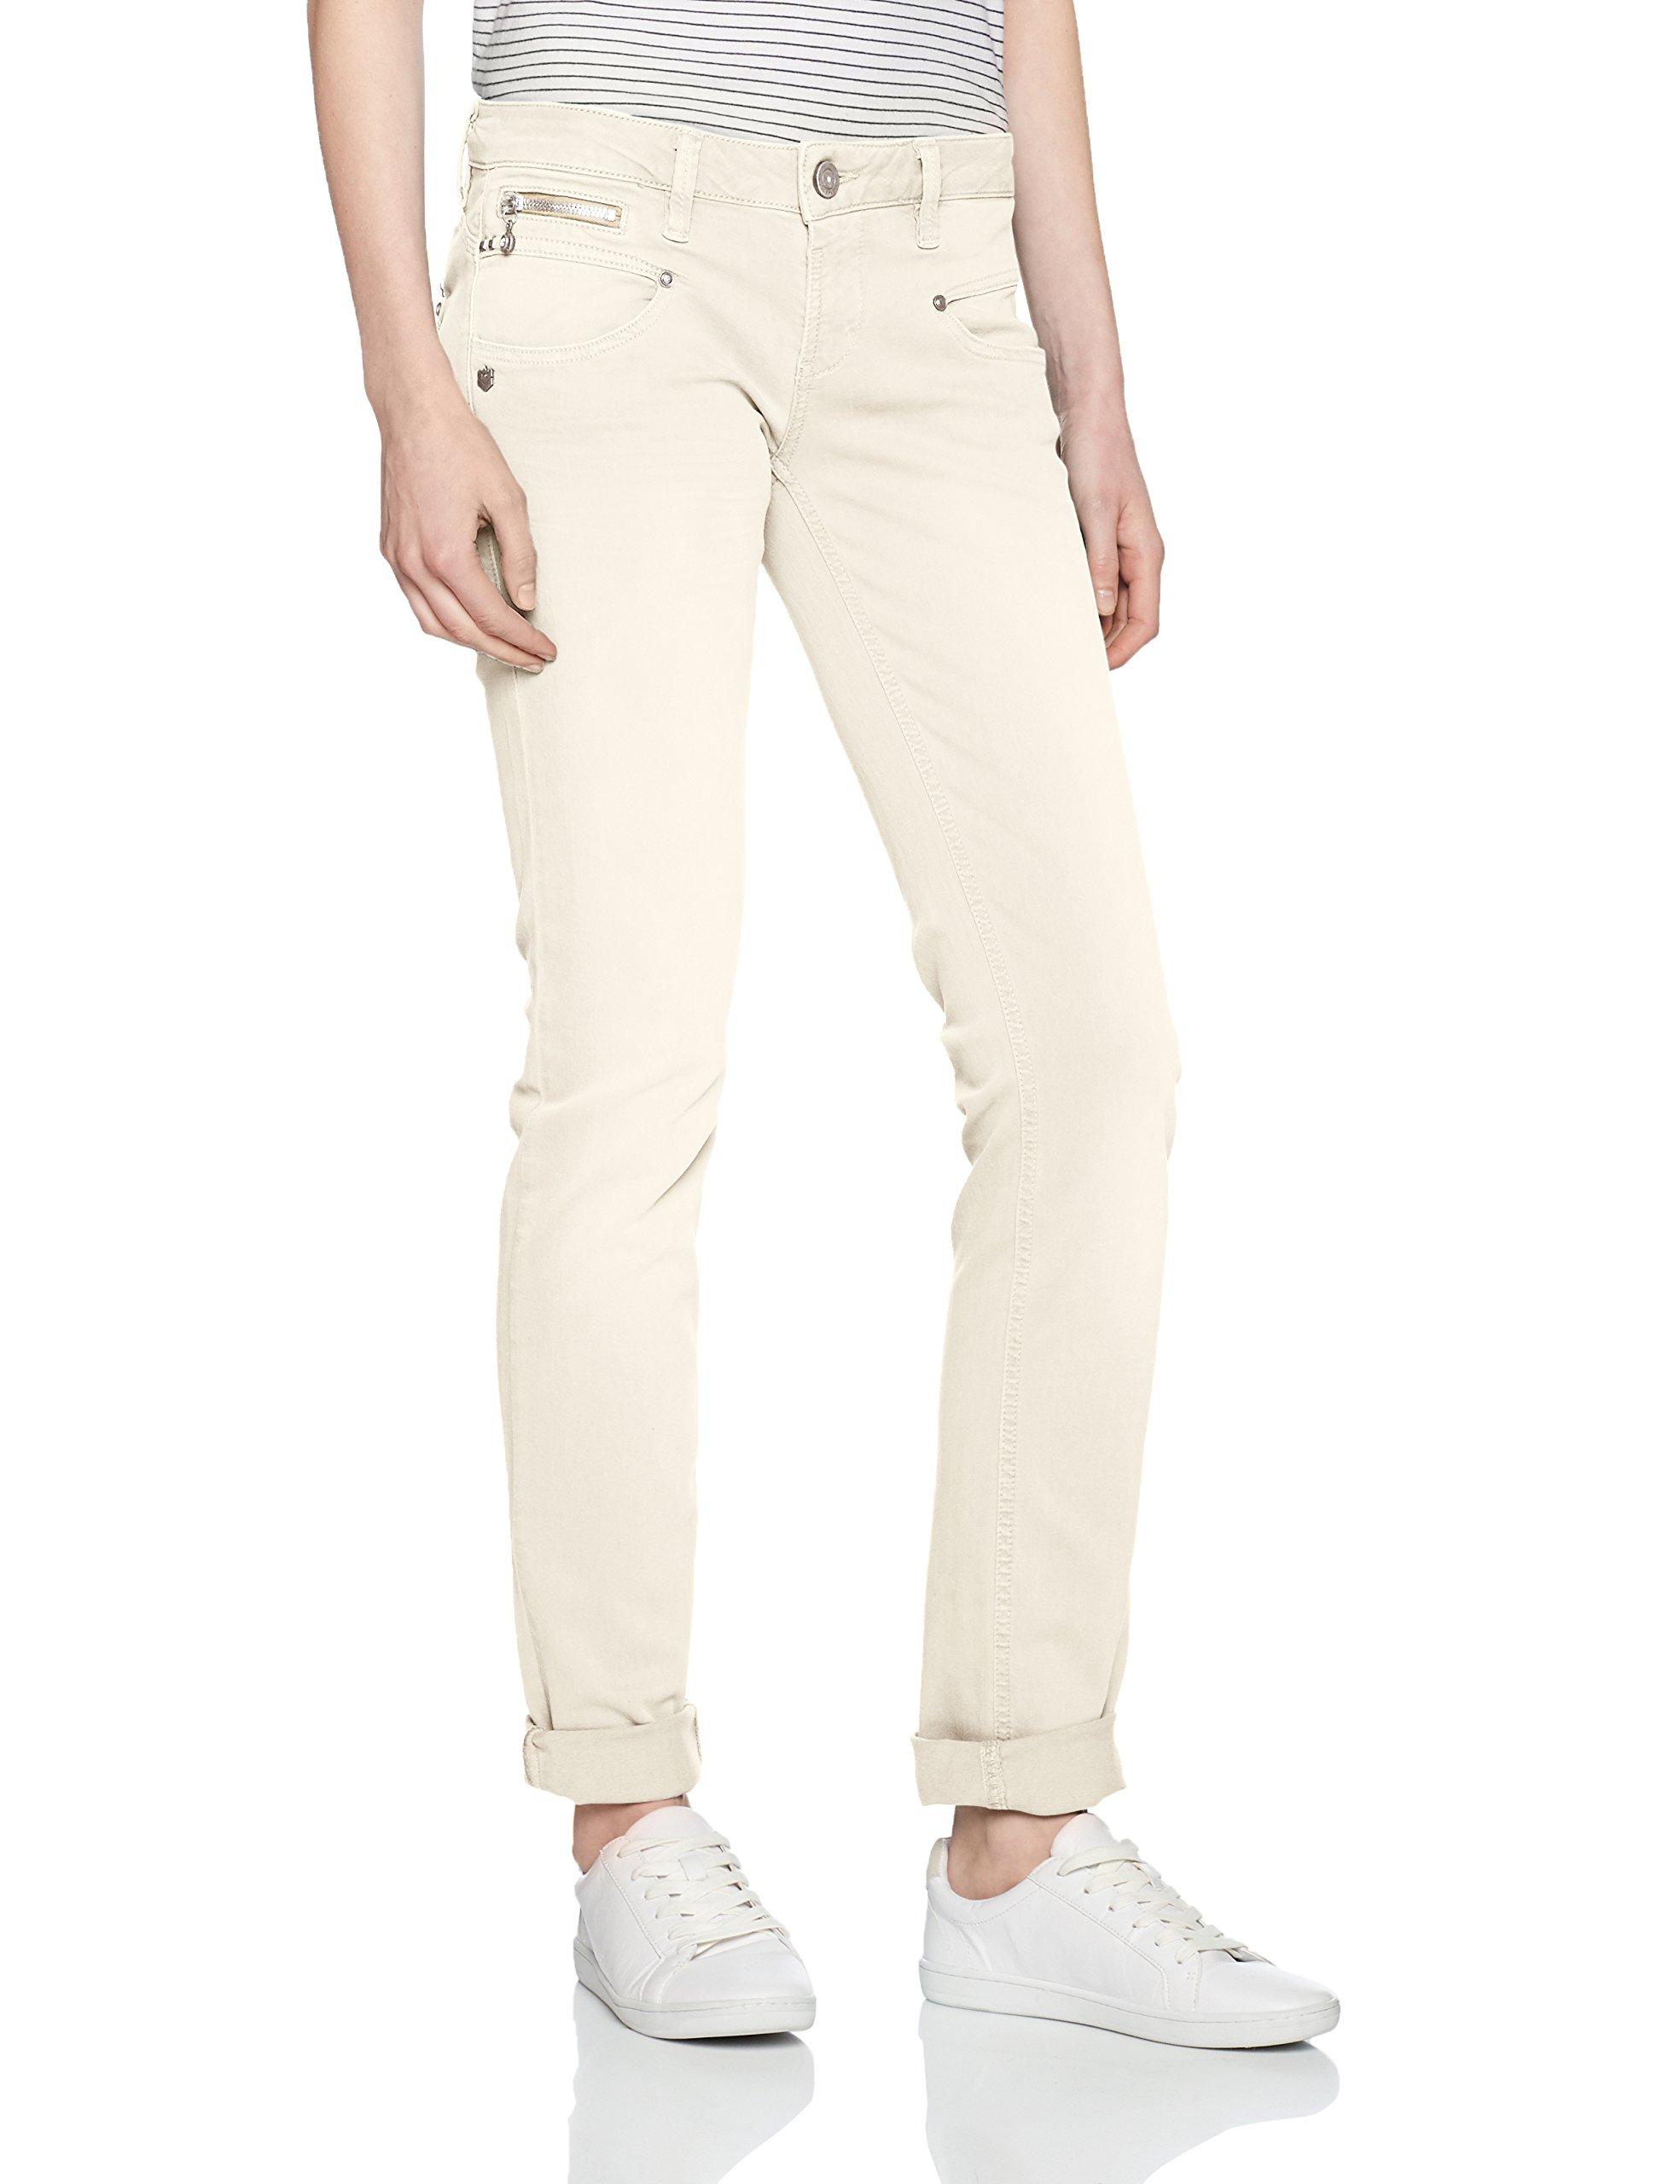 Freeman Alexa T porter PantalonBlancsnow WhiteW30taille Slim New Color Magic FabricantLFemme 3qAR4j5ScL